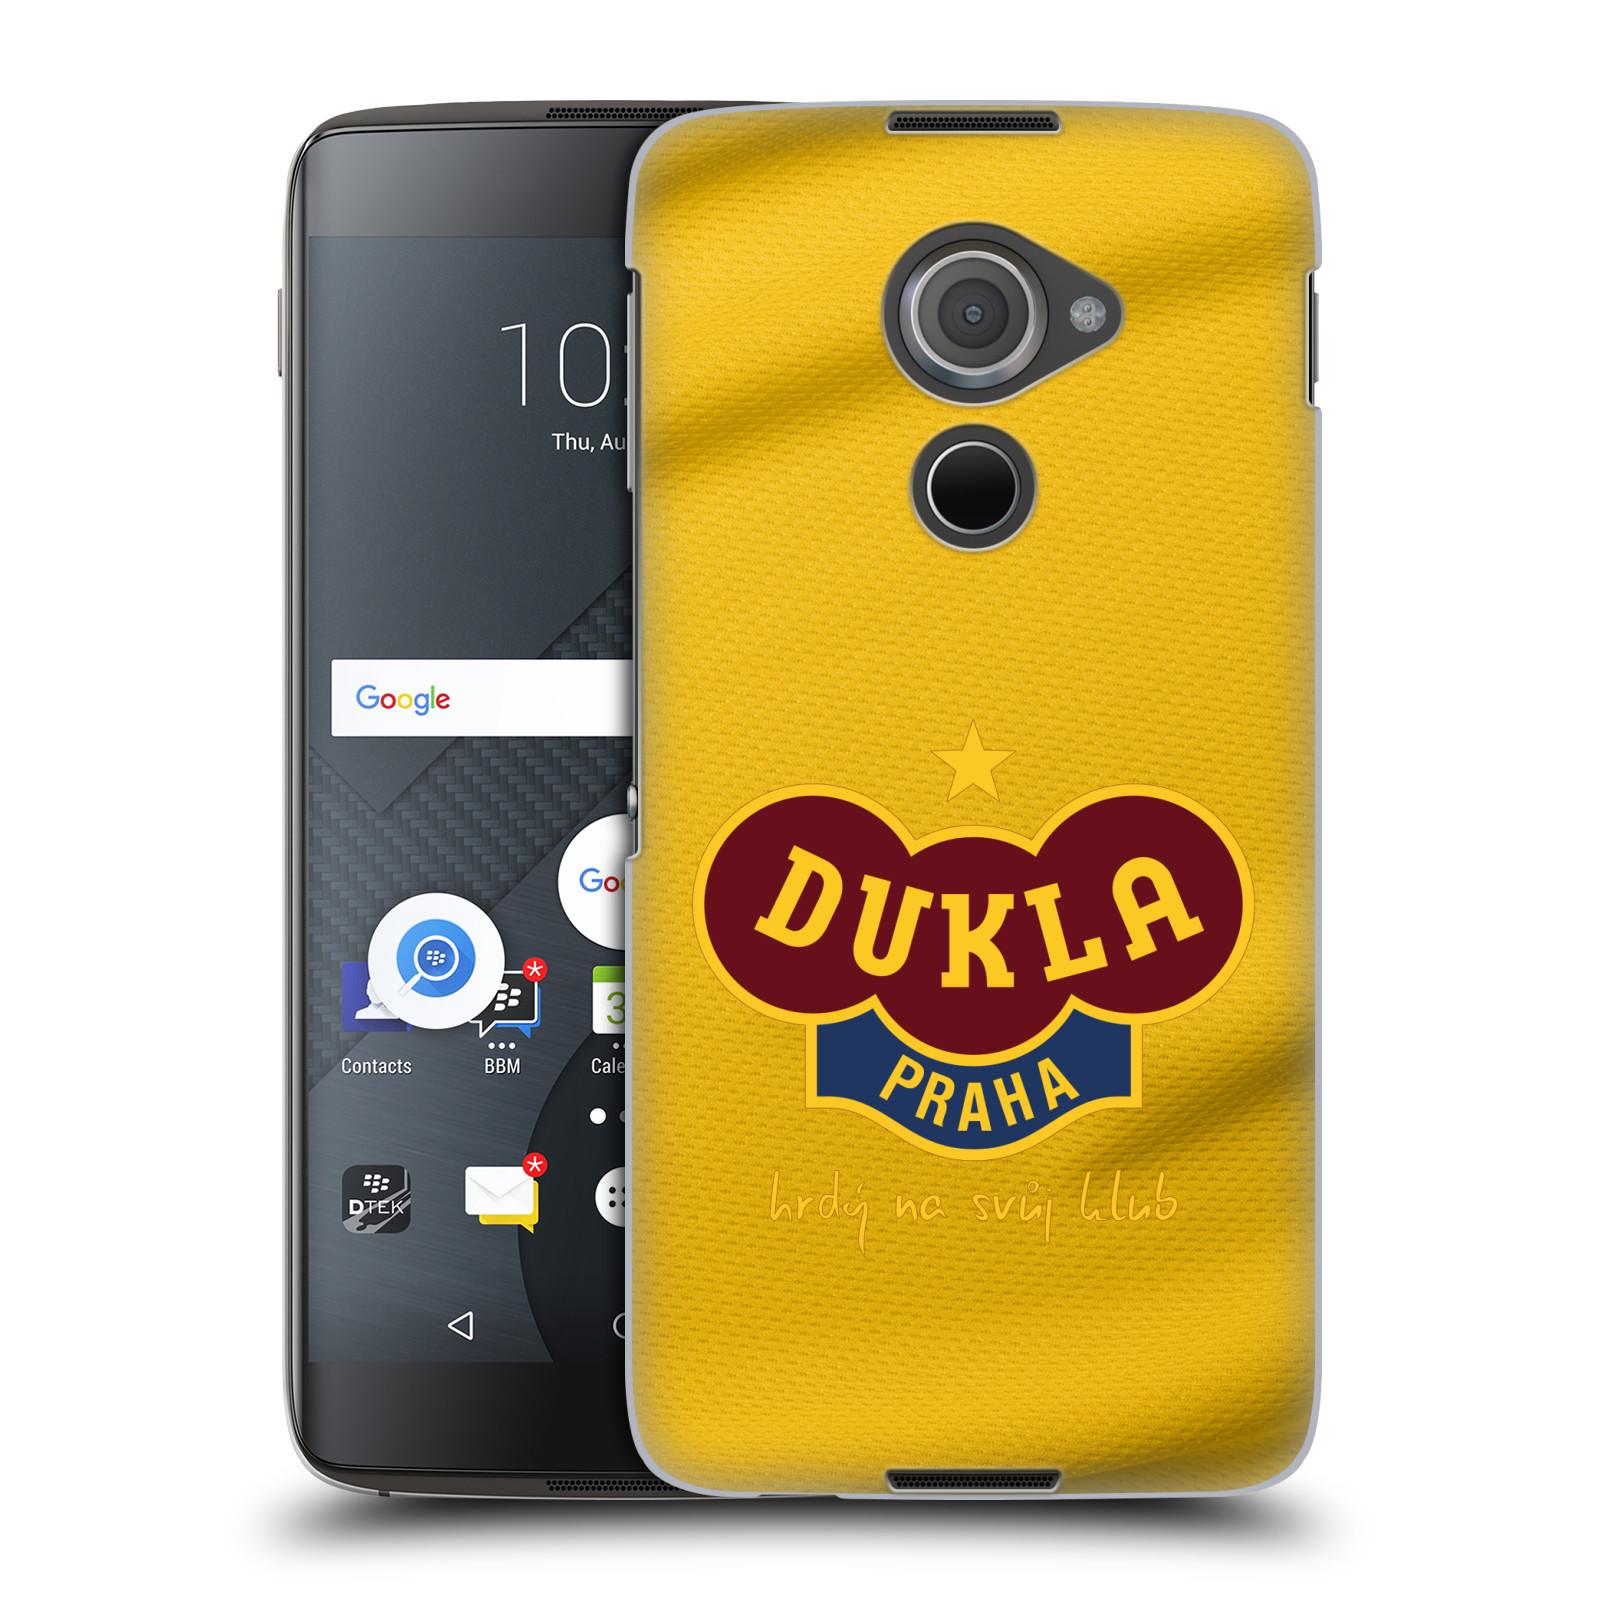 Plastové pouzdro na mobil Blackberry DTEK60 (Argon) - FK Dukla Praha - Žlutý dres